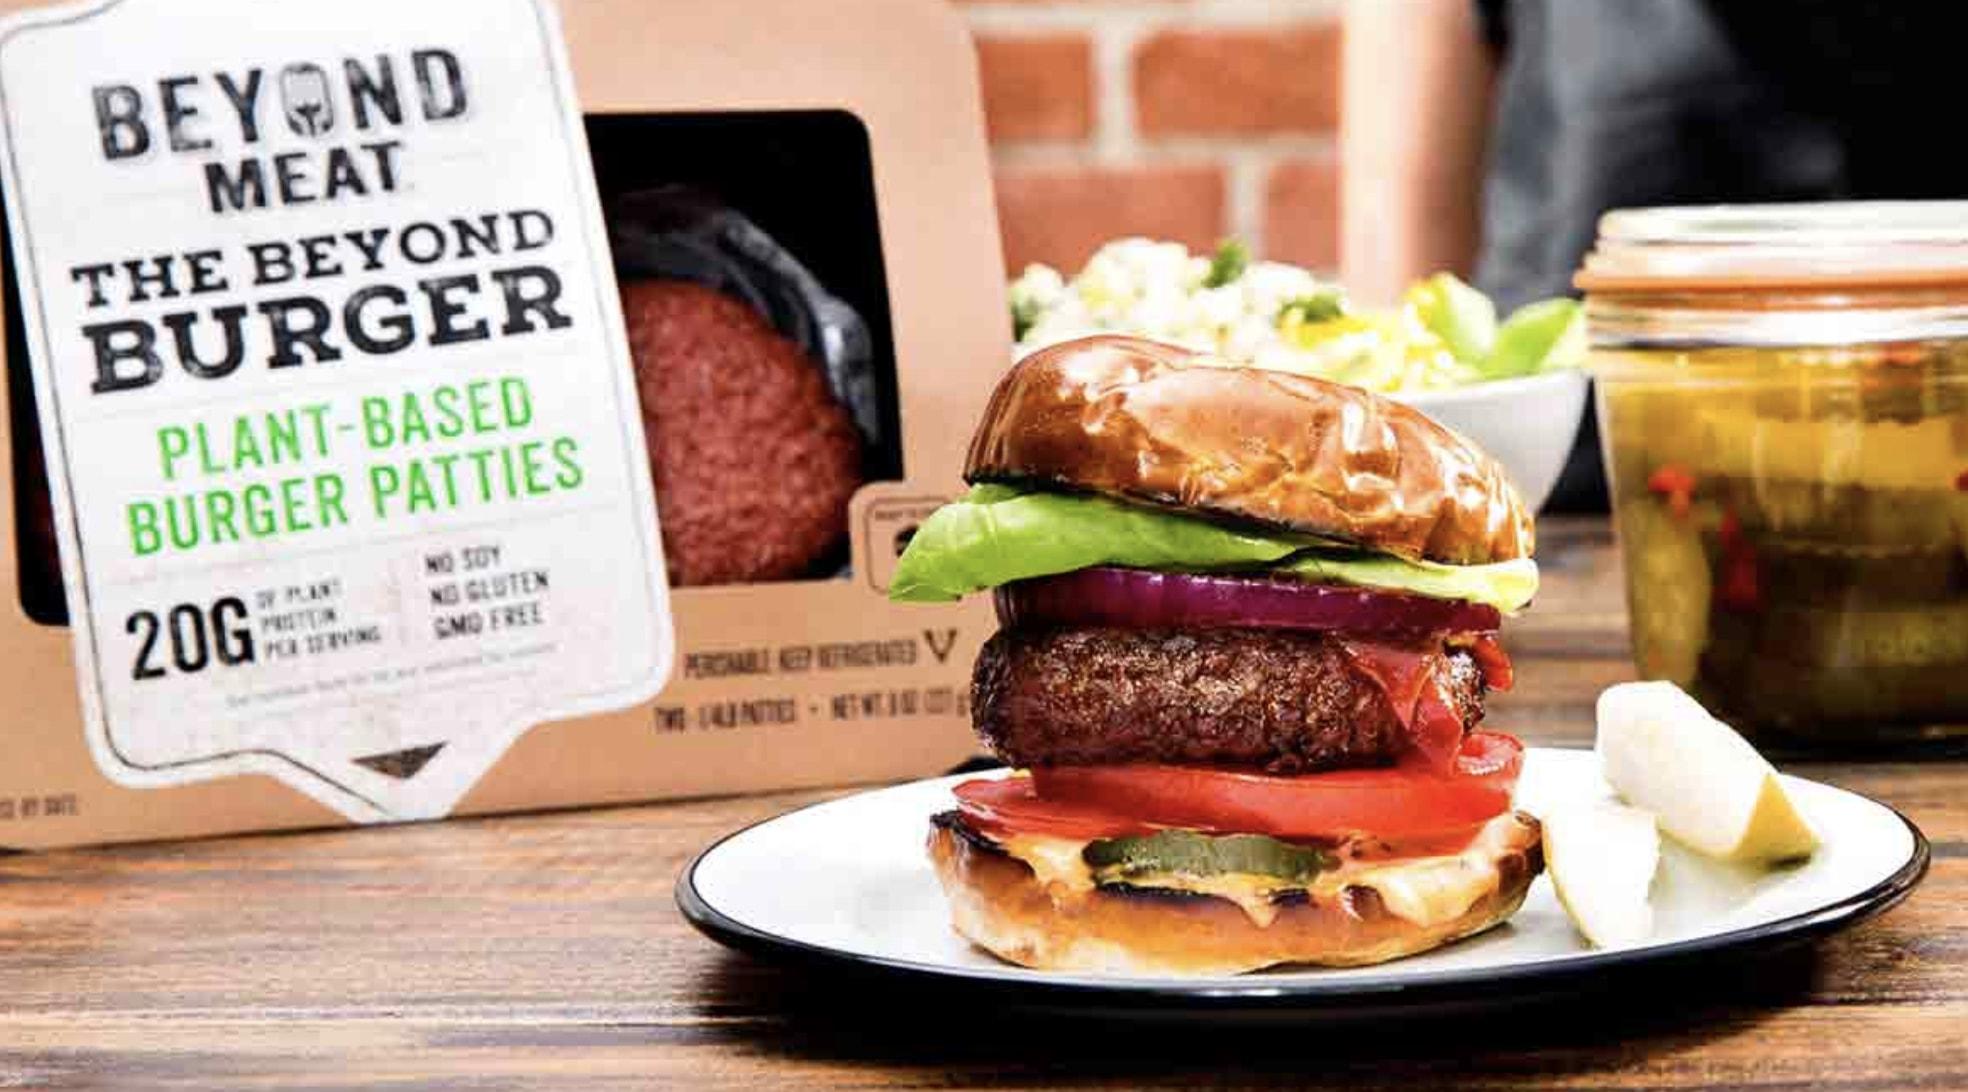 5a1ec0d9043ecd00016385c9_vegan_plantbased_burger-2.jpg